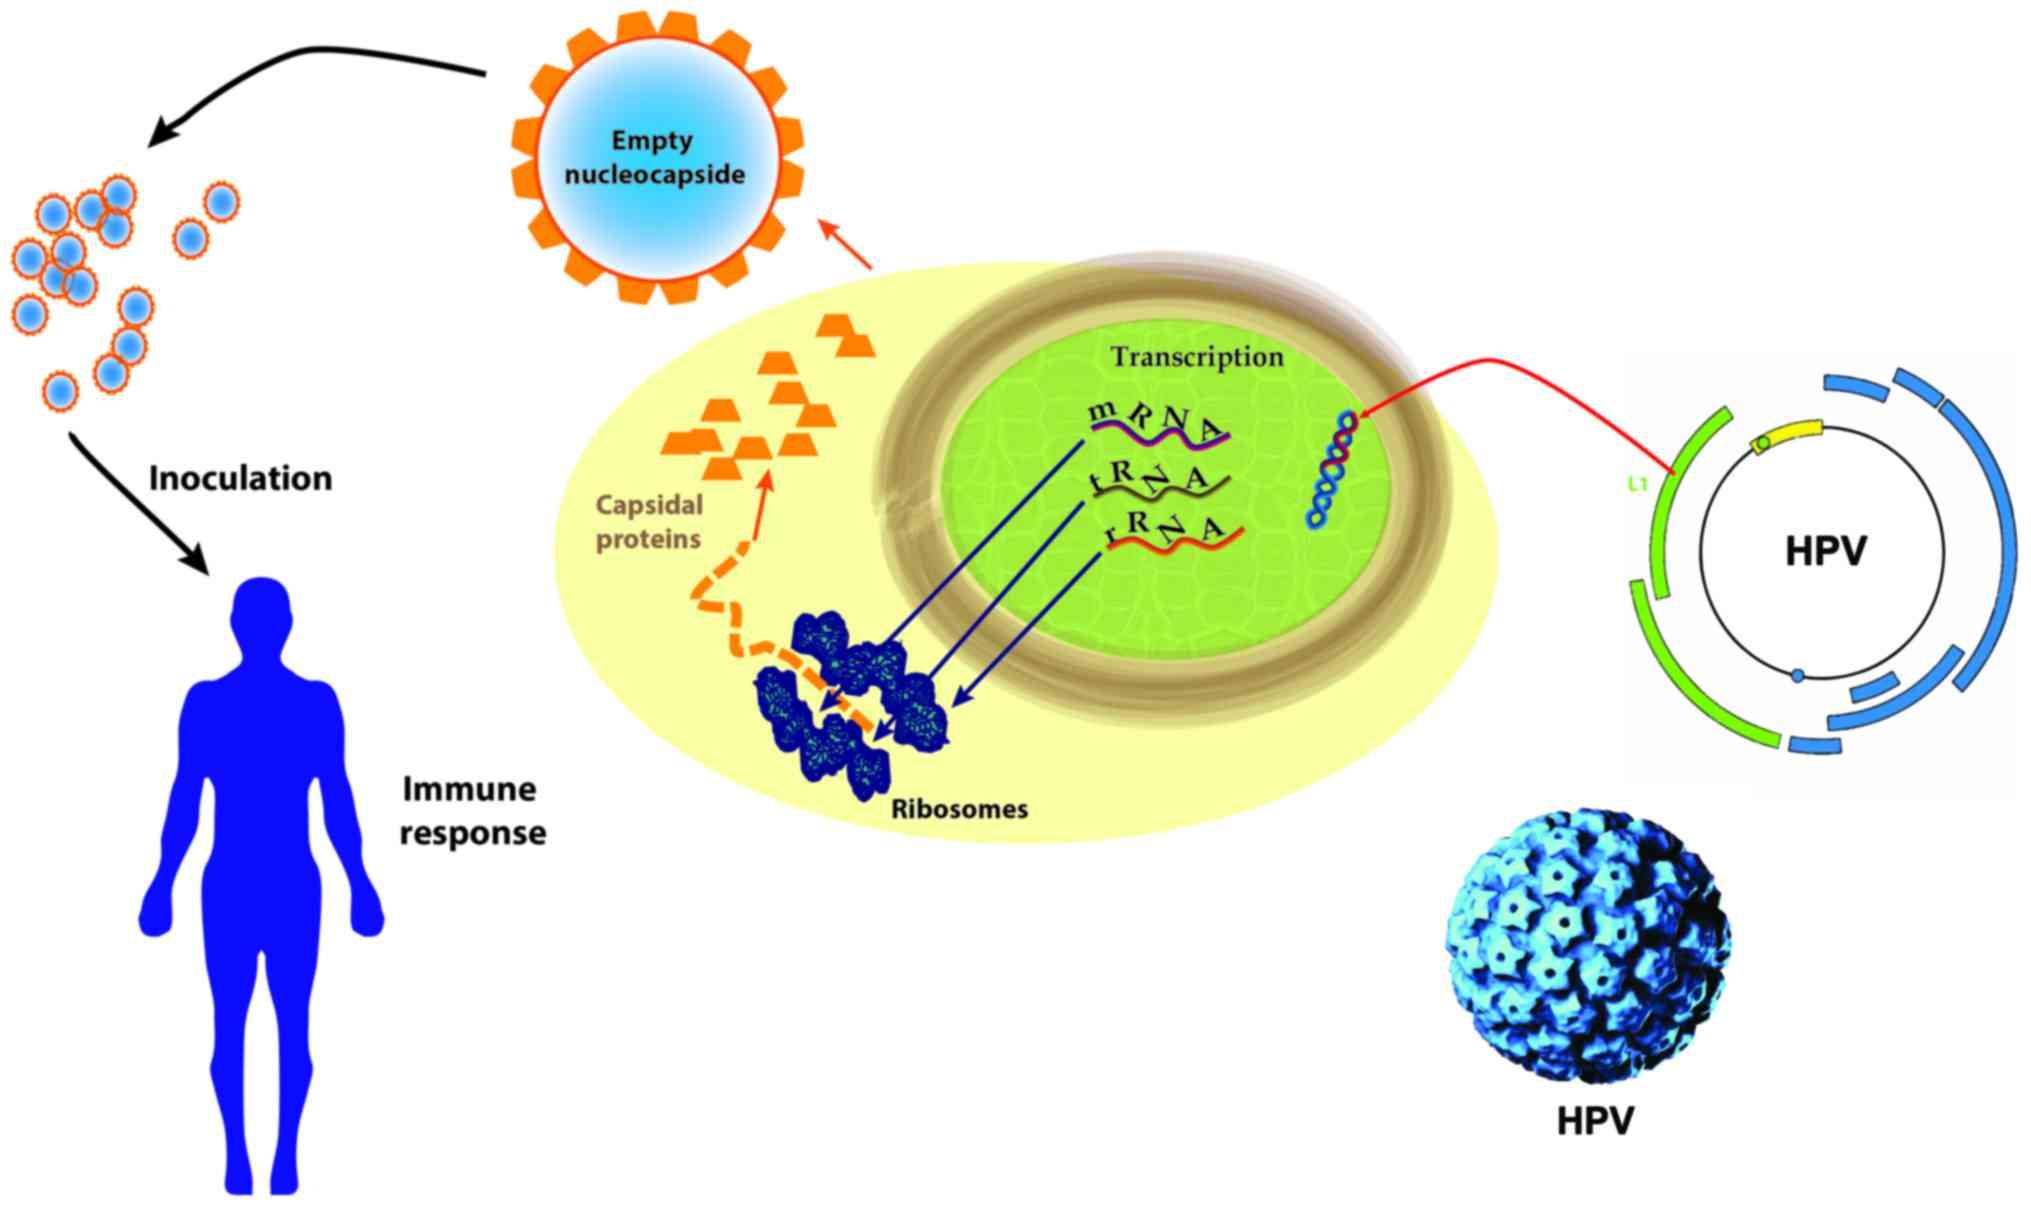 hpv viral or bacterial cancer pulmonar raguseala